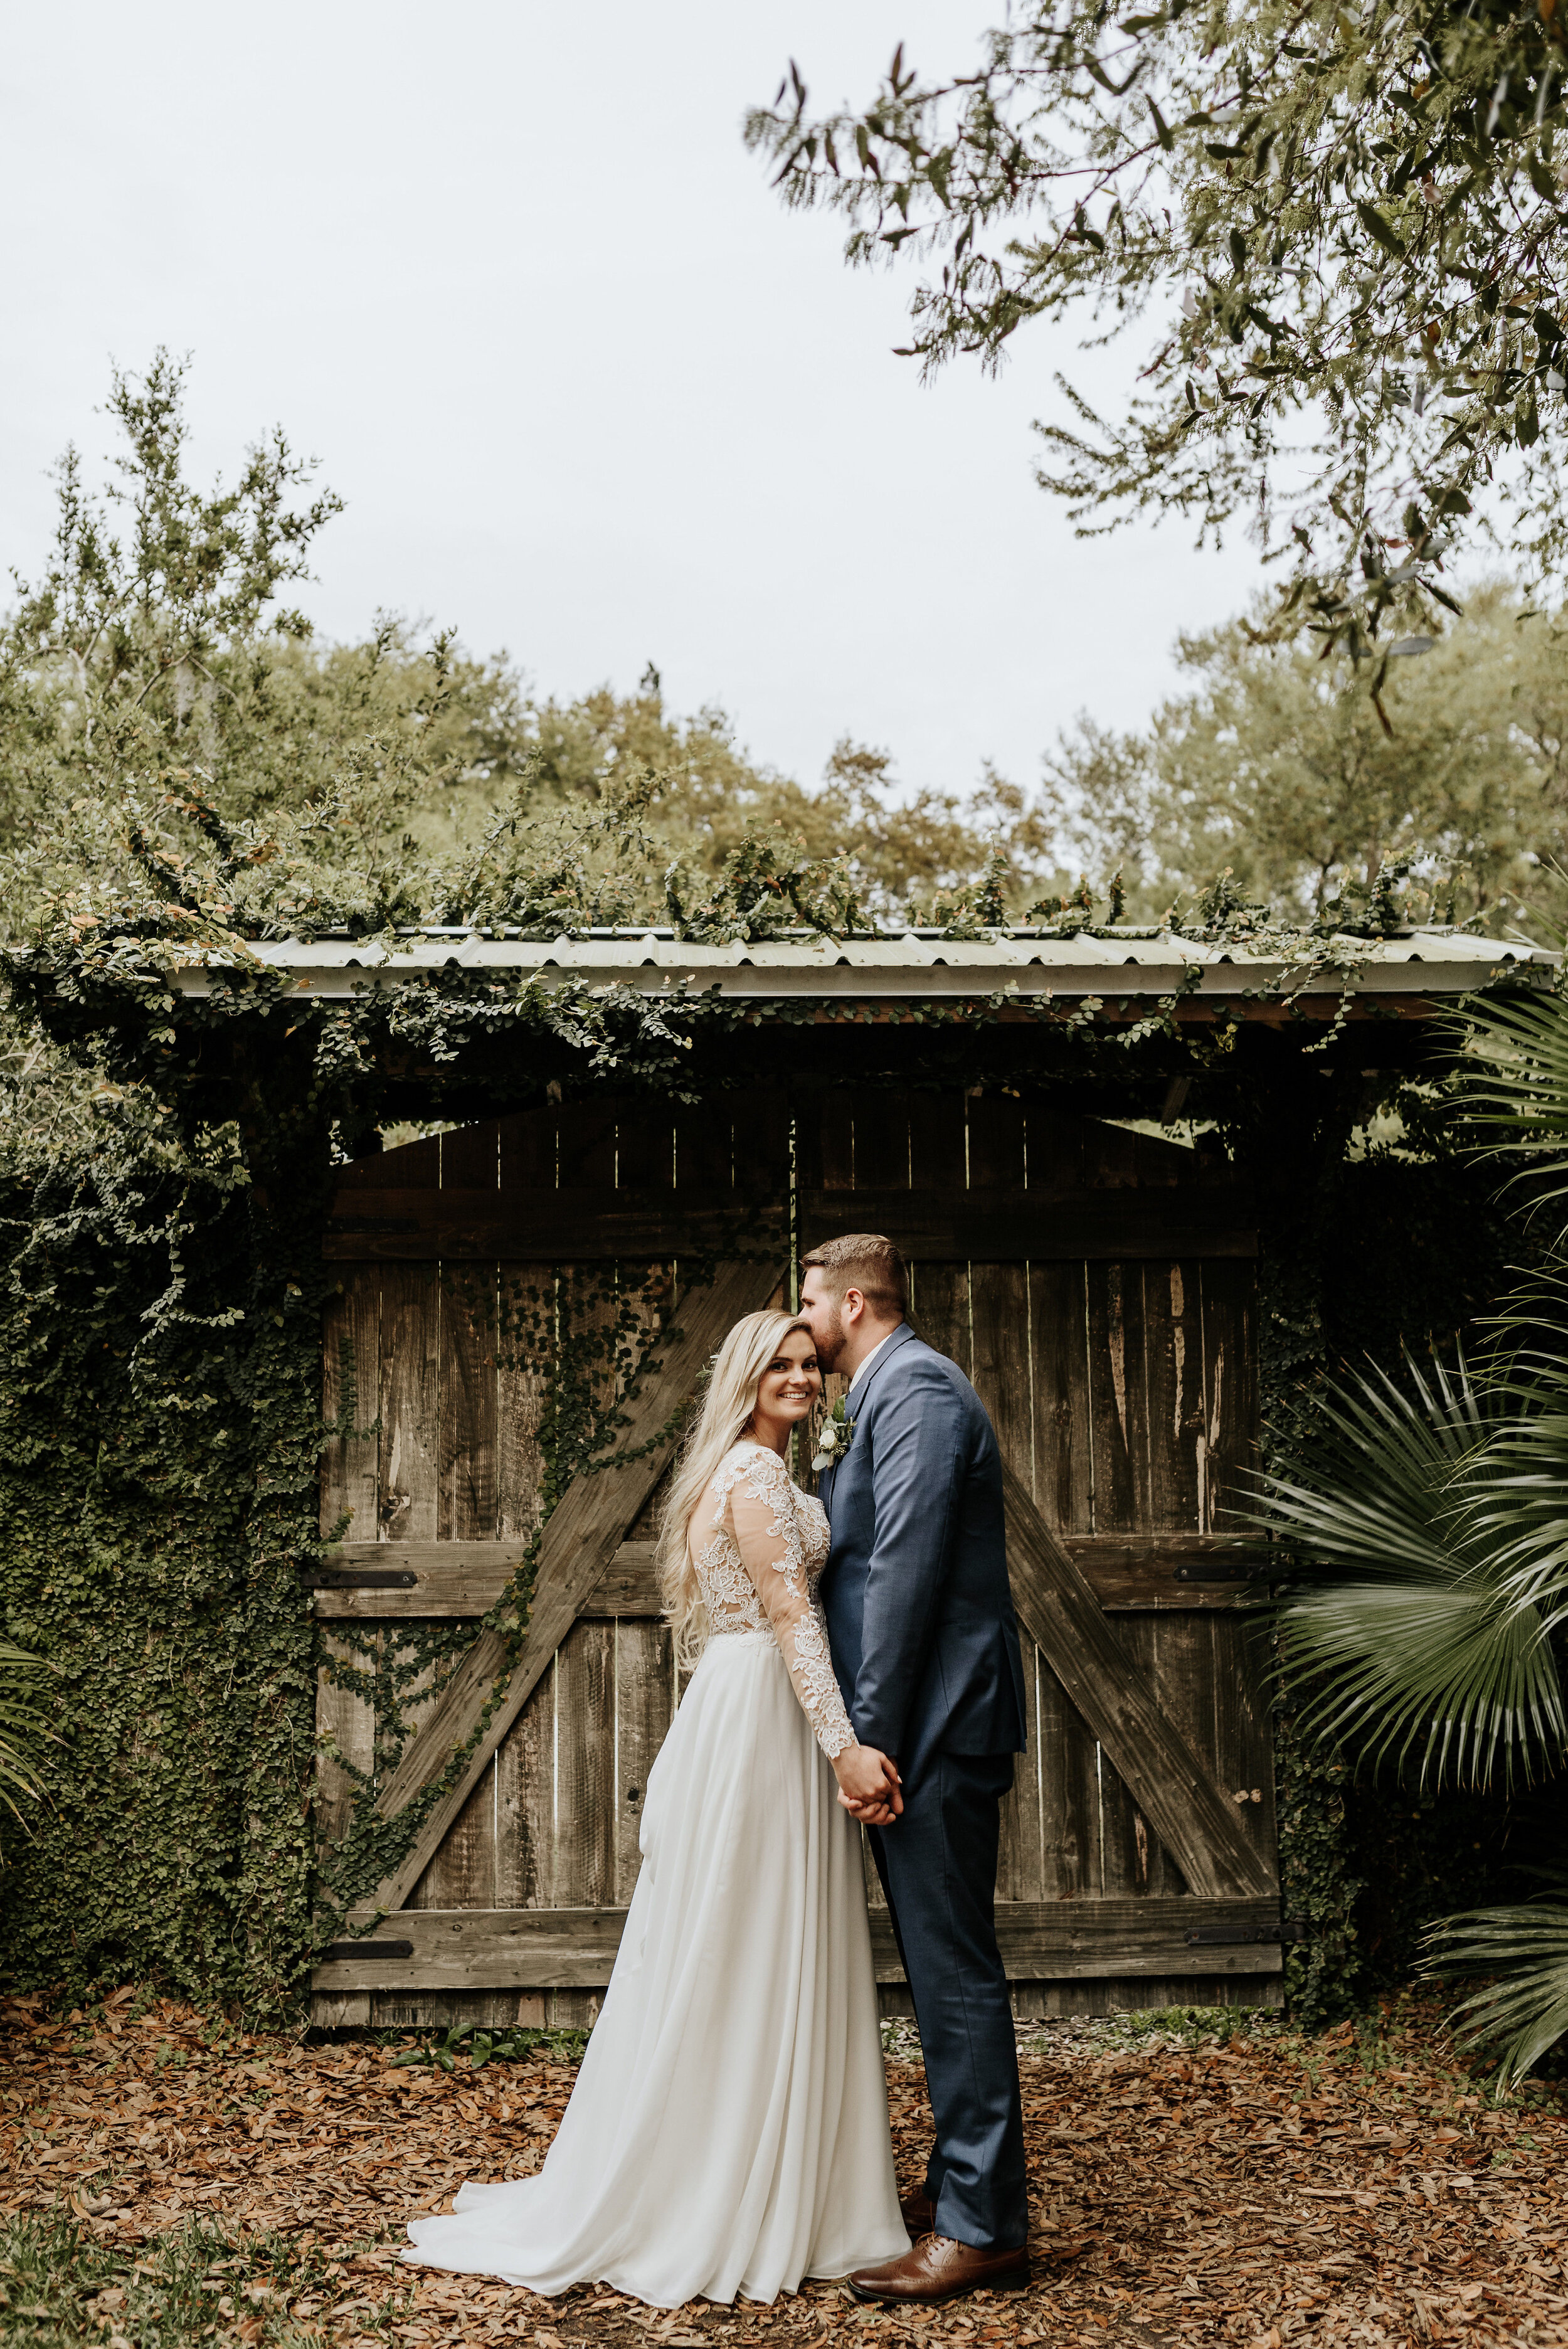 Mikenzi_Brad_Wedding_The_Delamater_House_New_Smyrna_Beach_Florida_Photography_by_V_0826.jpg